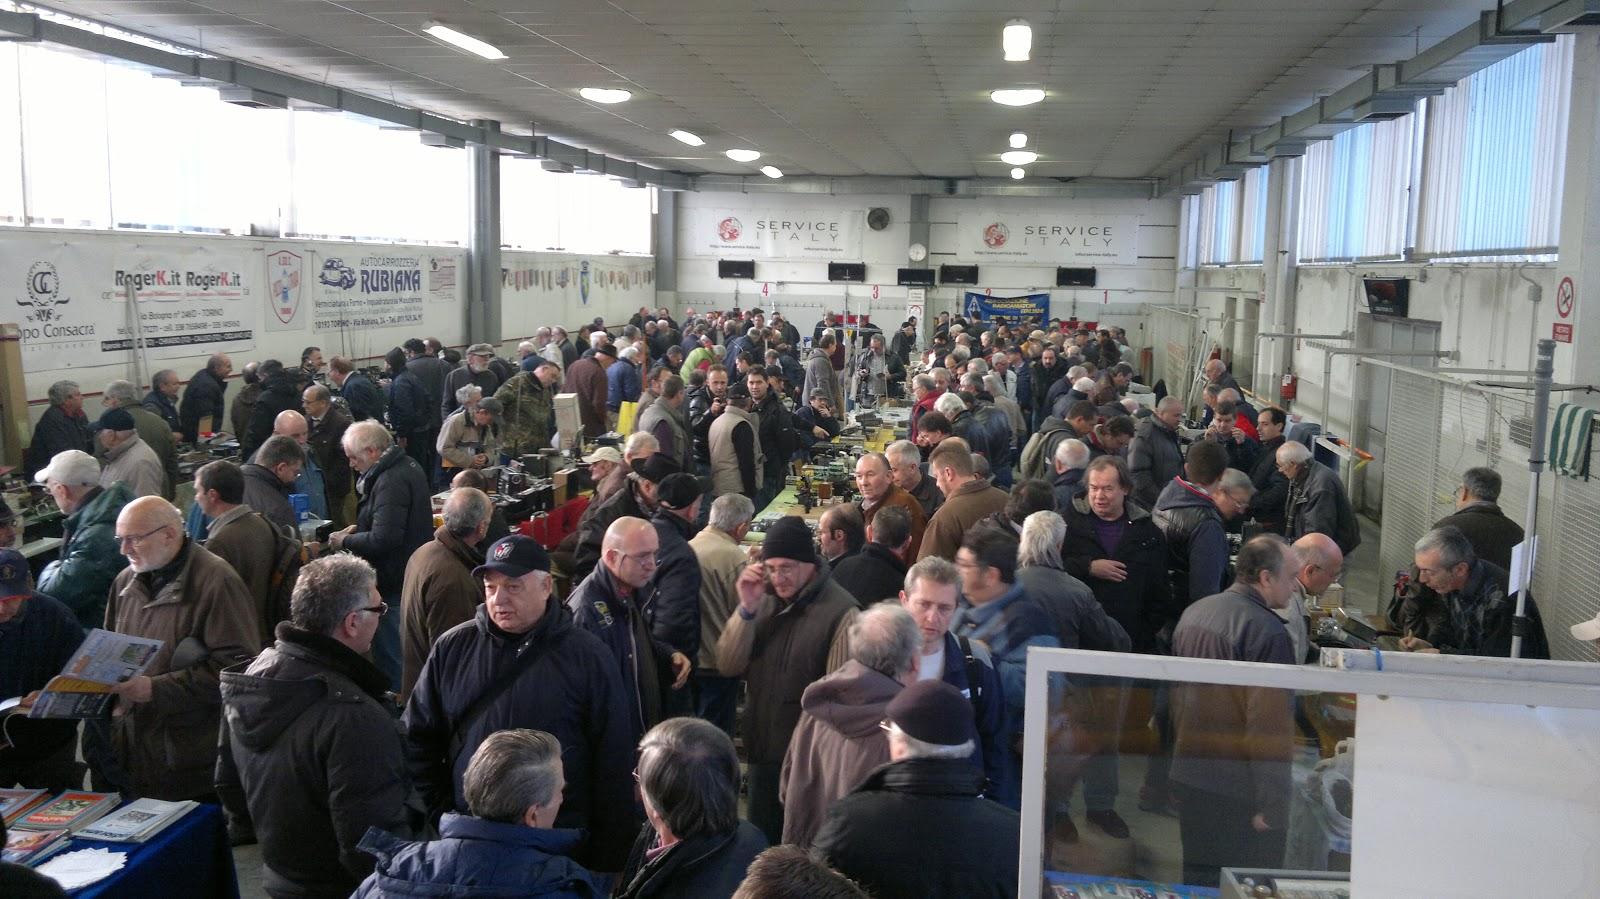 Air radiorama mercatino ari di torino for Mercatini torino oggi